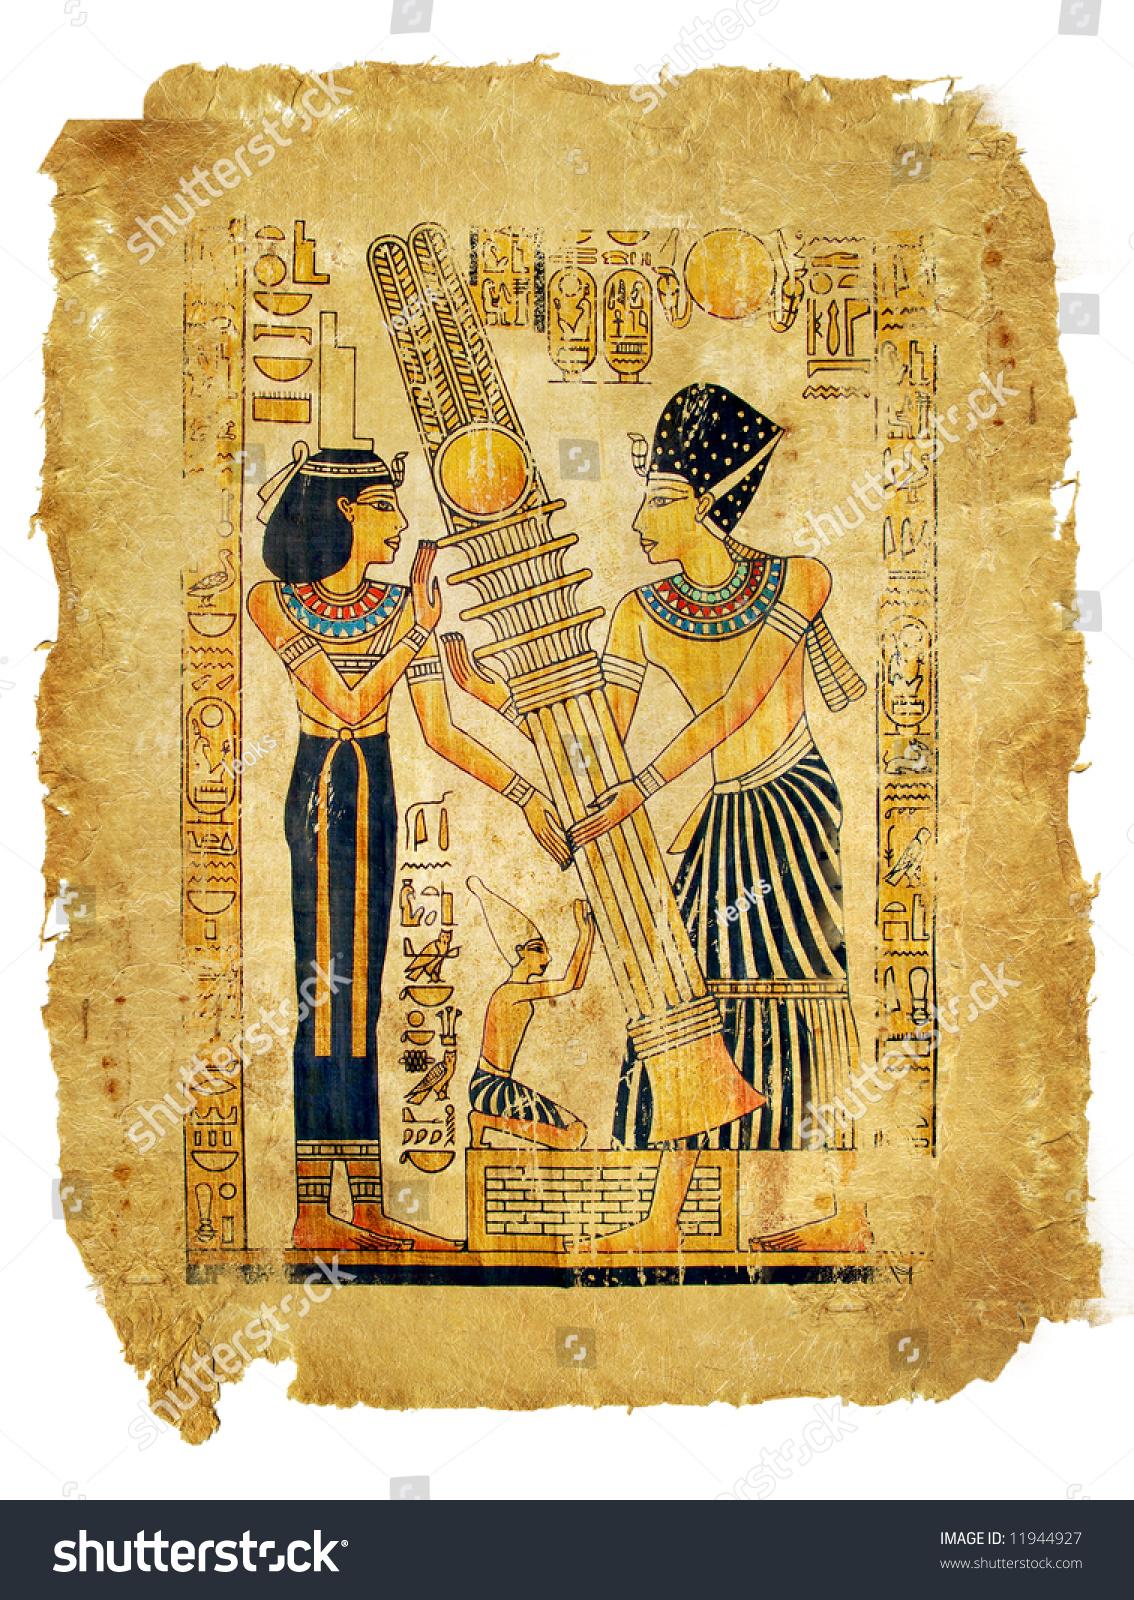 Ancient egyptian papyrus parchment stock photo